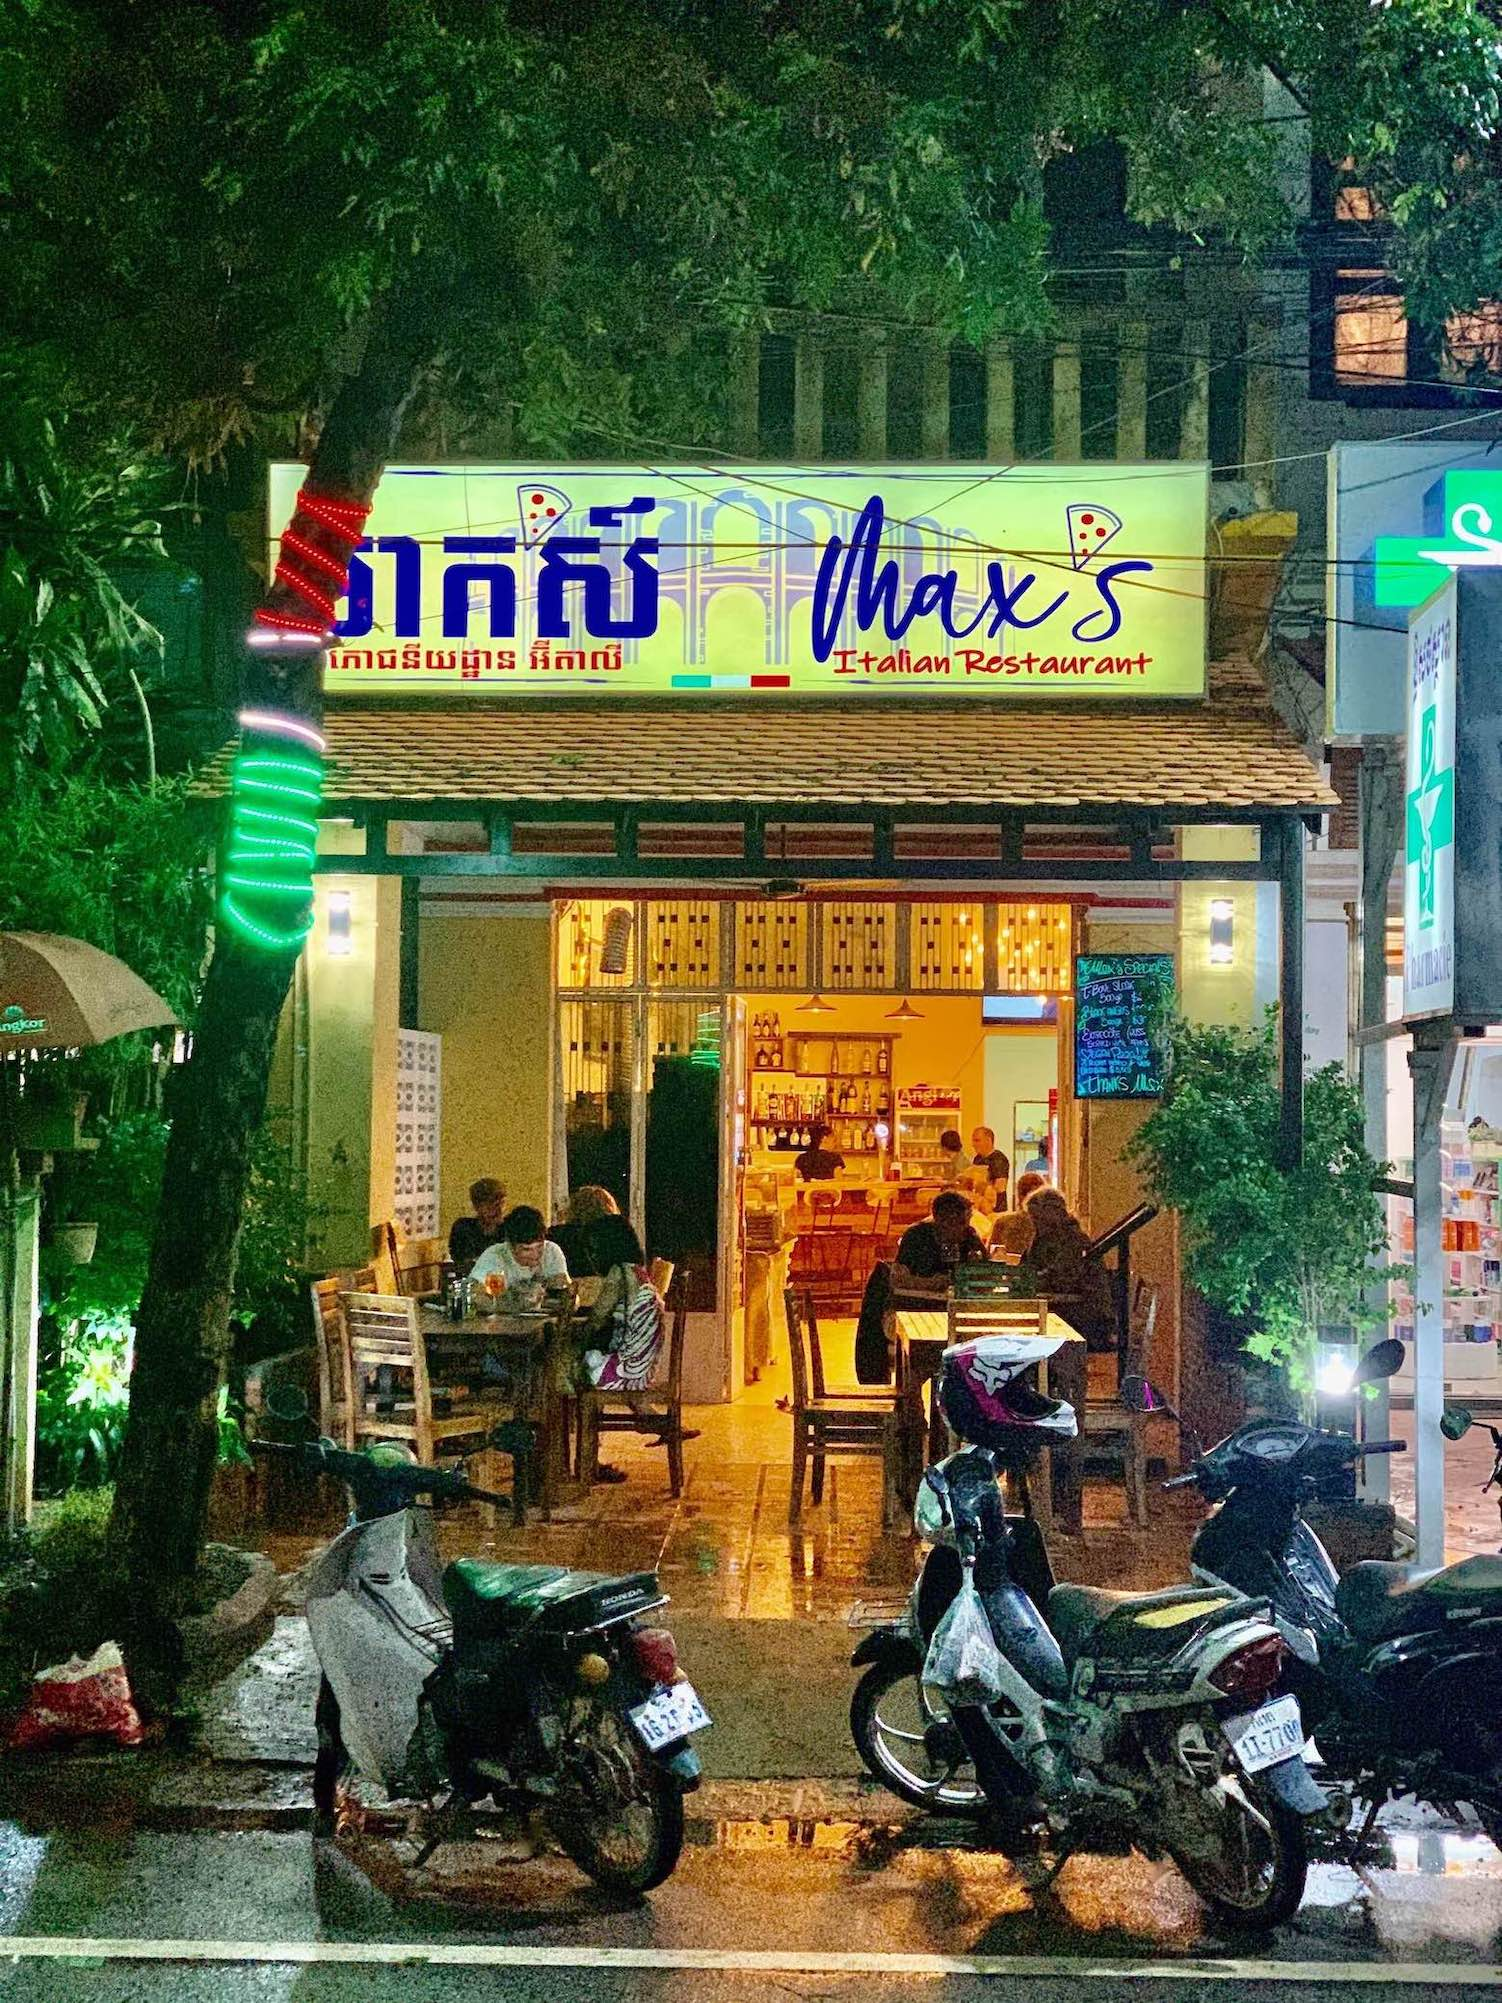 Max's Italian Restaurant Kampot.